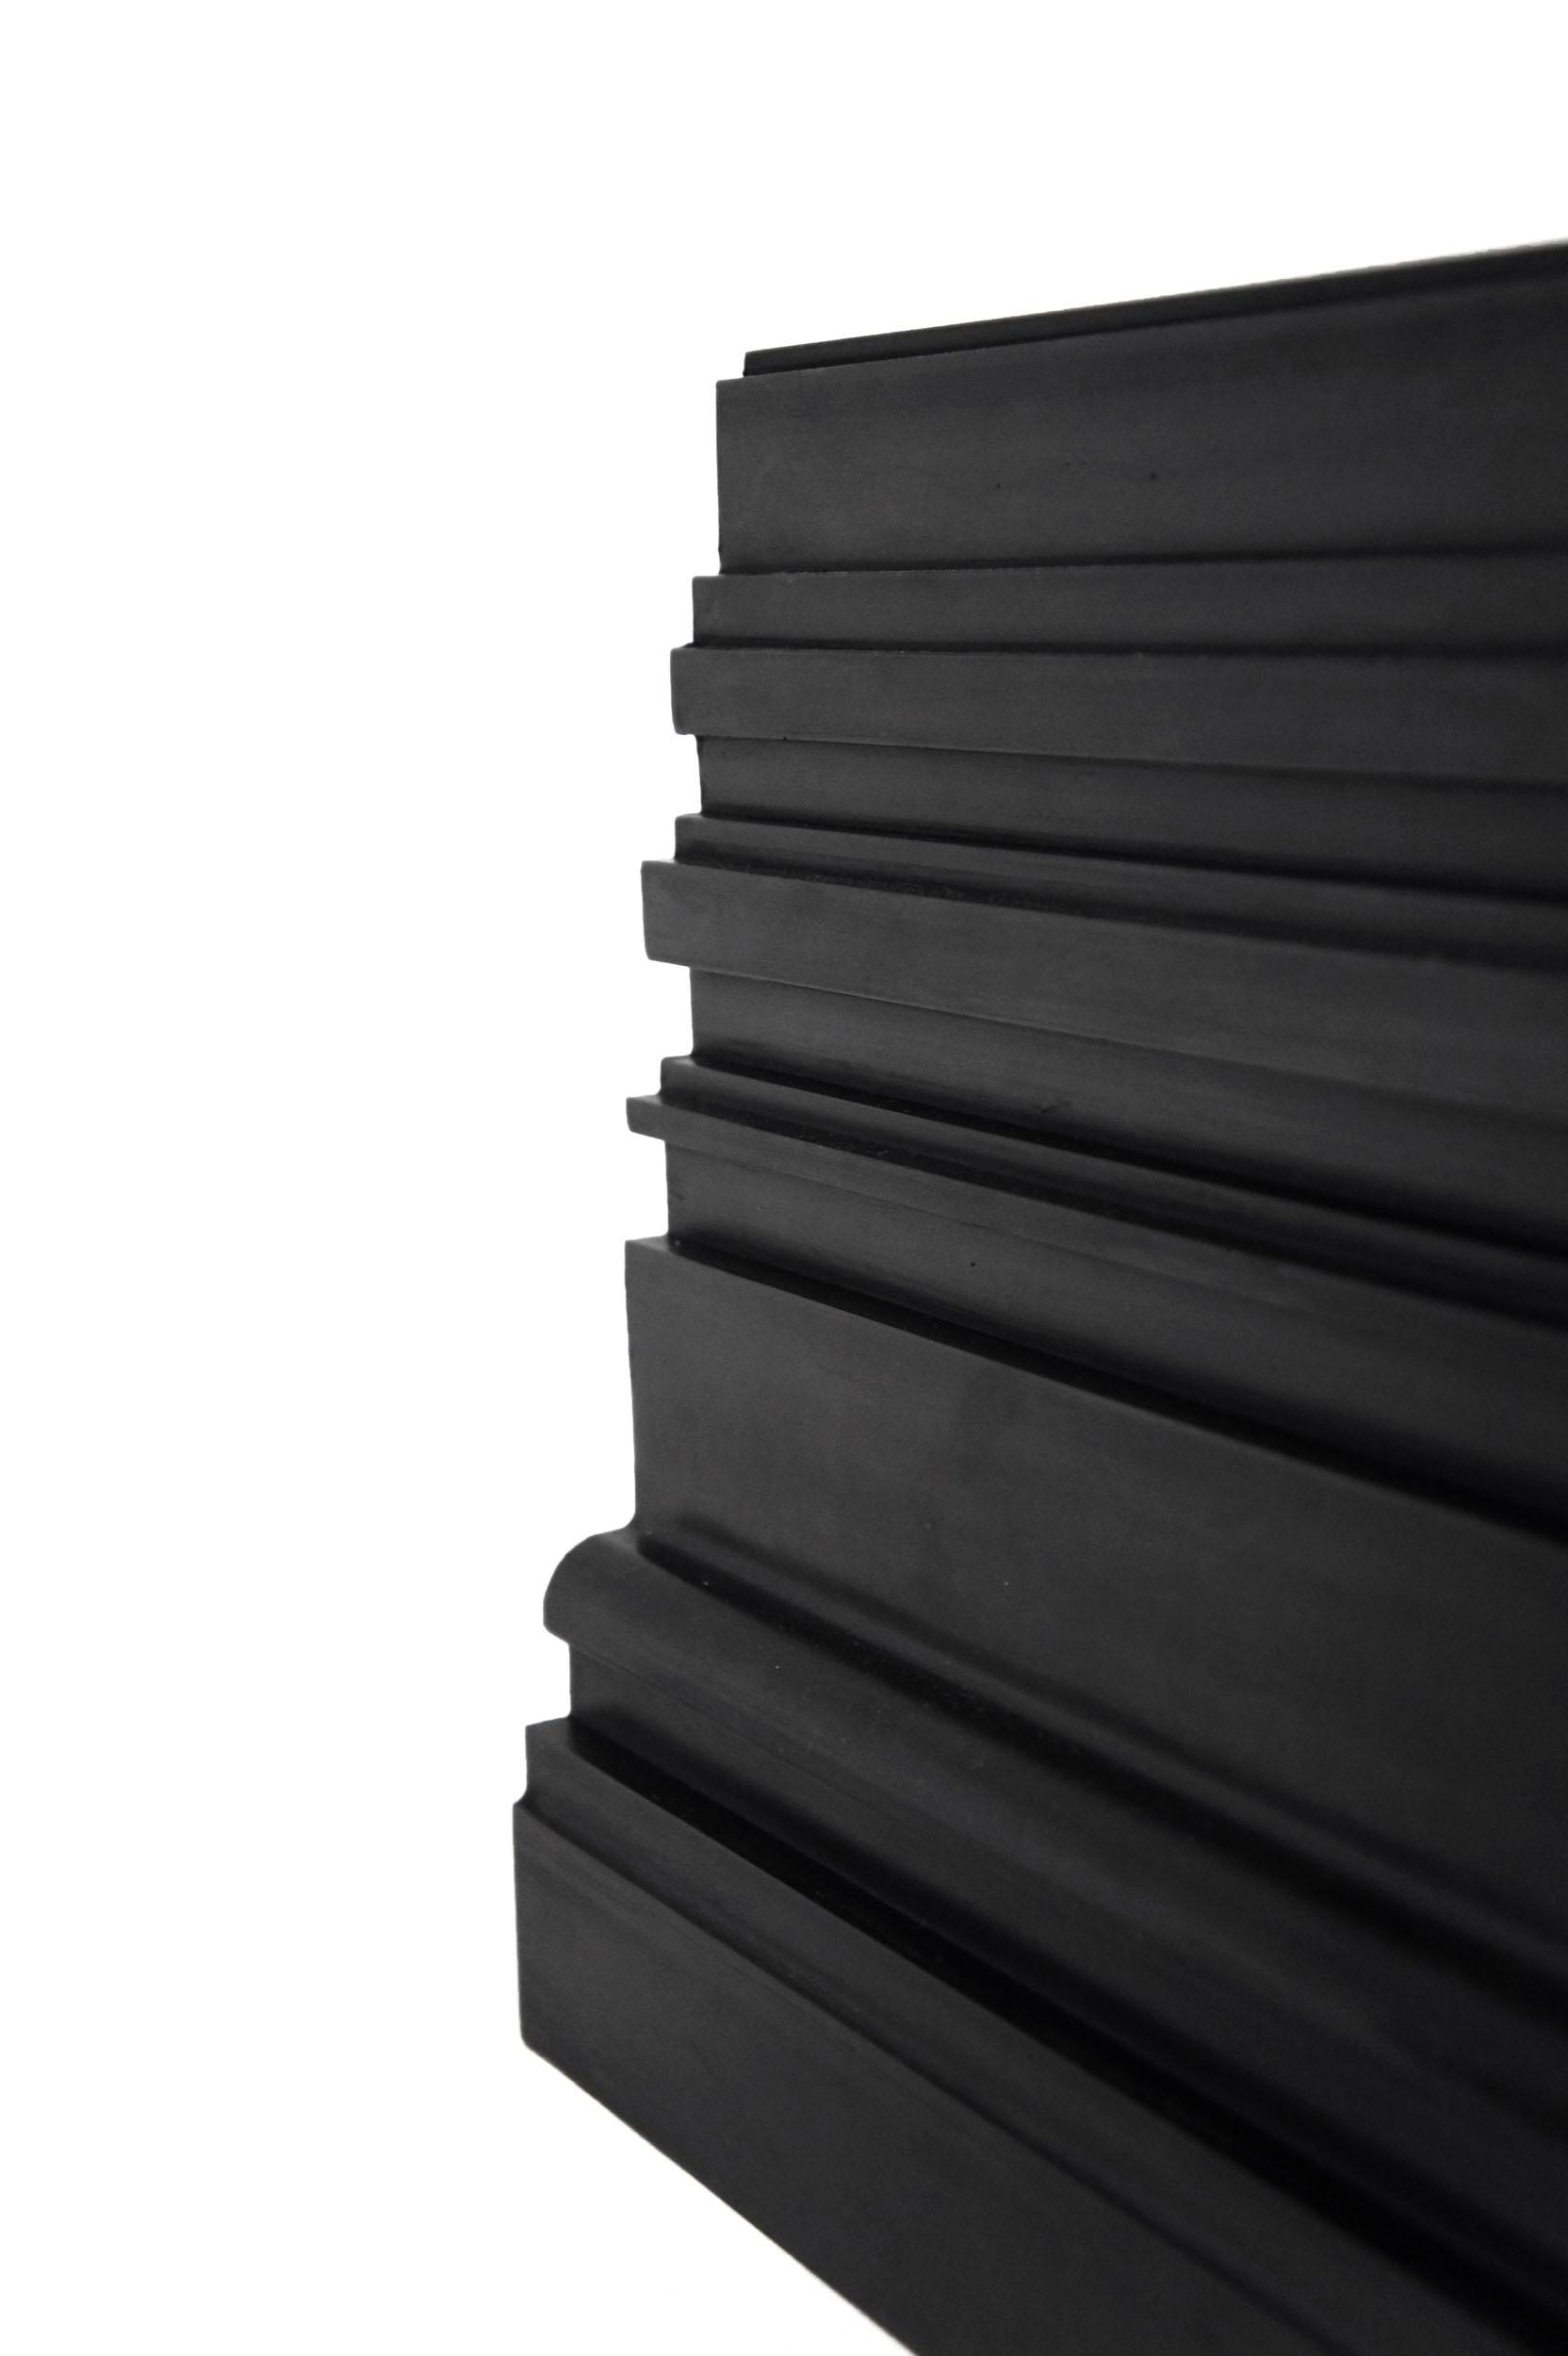 A black Bench Mould shelf in linear profile